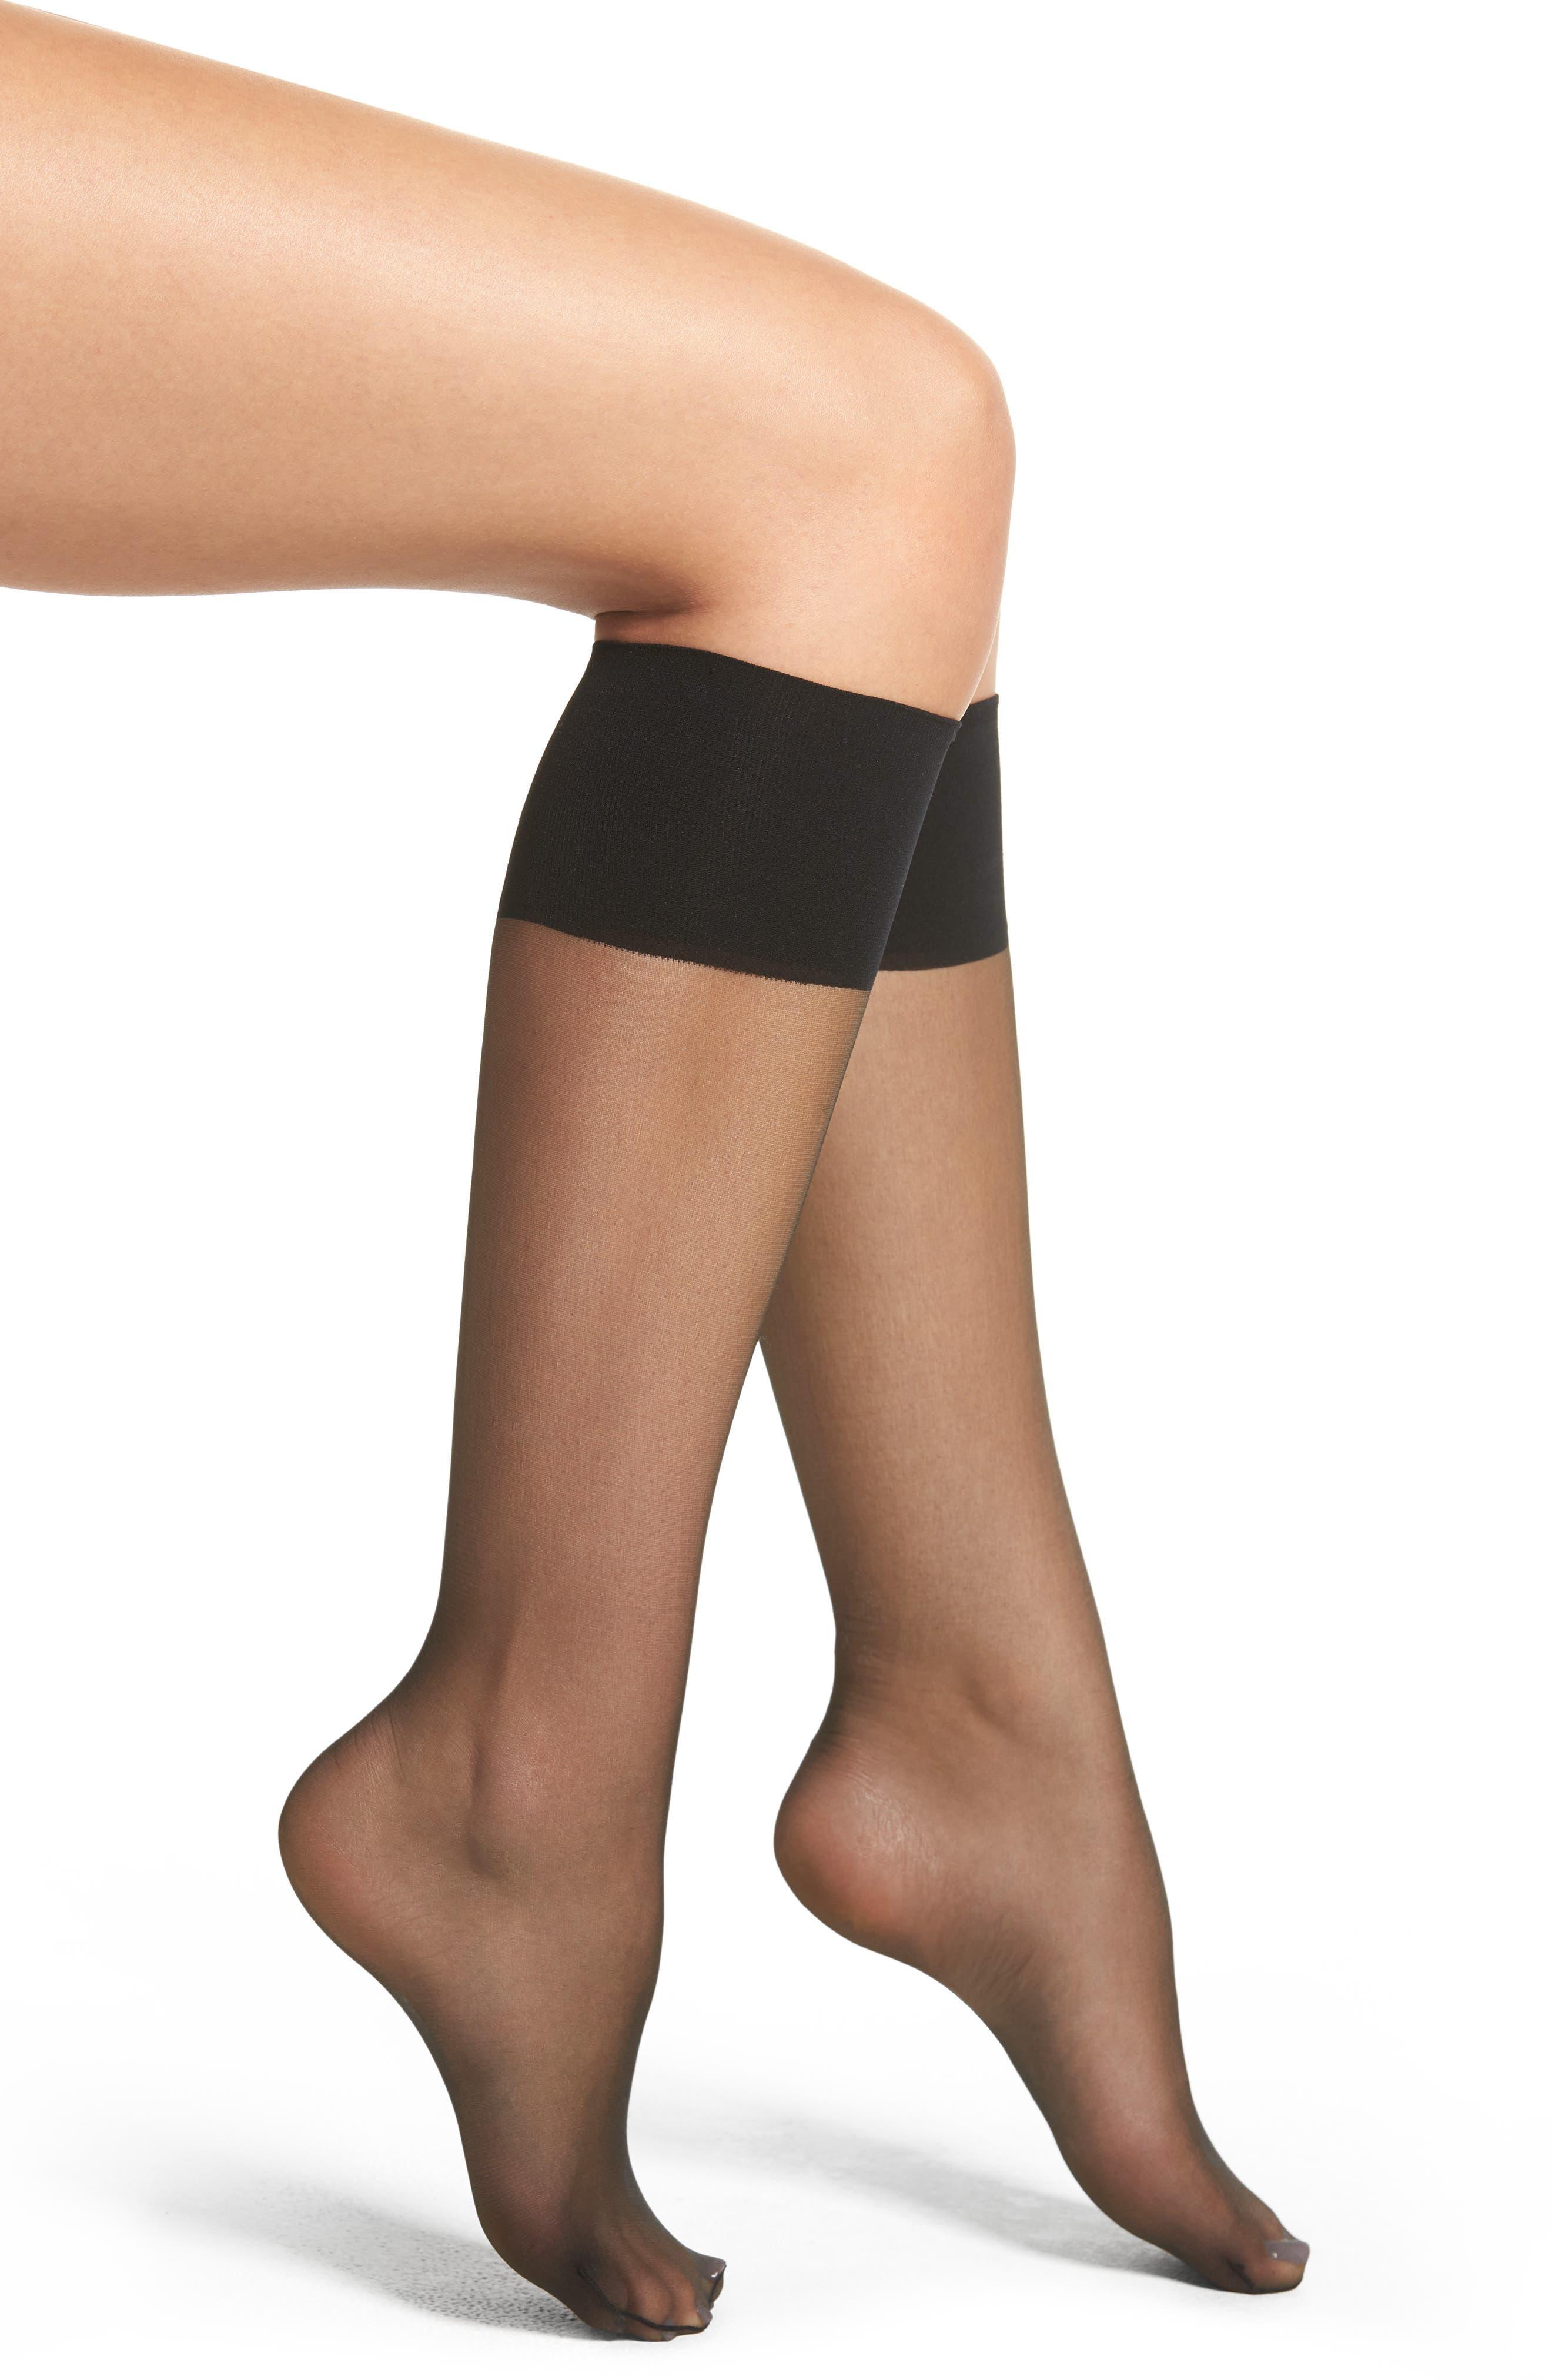 NORDSTROM, 2-Pack Naked Sheer Knee Highs, Main thumbnail 1, color, BLACK